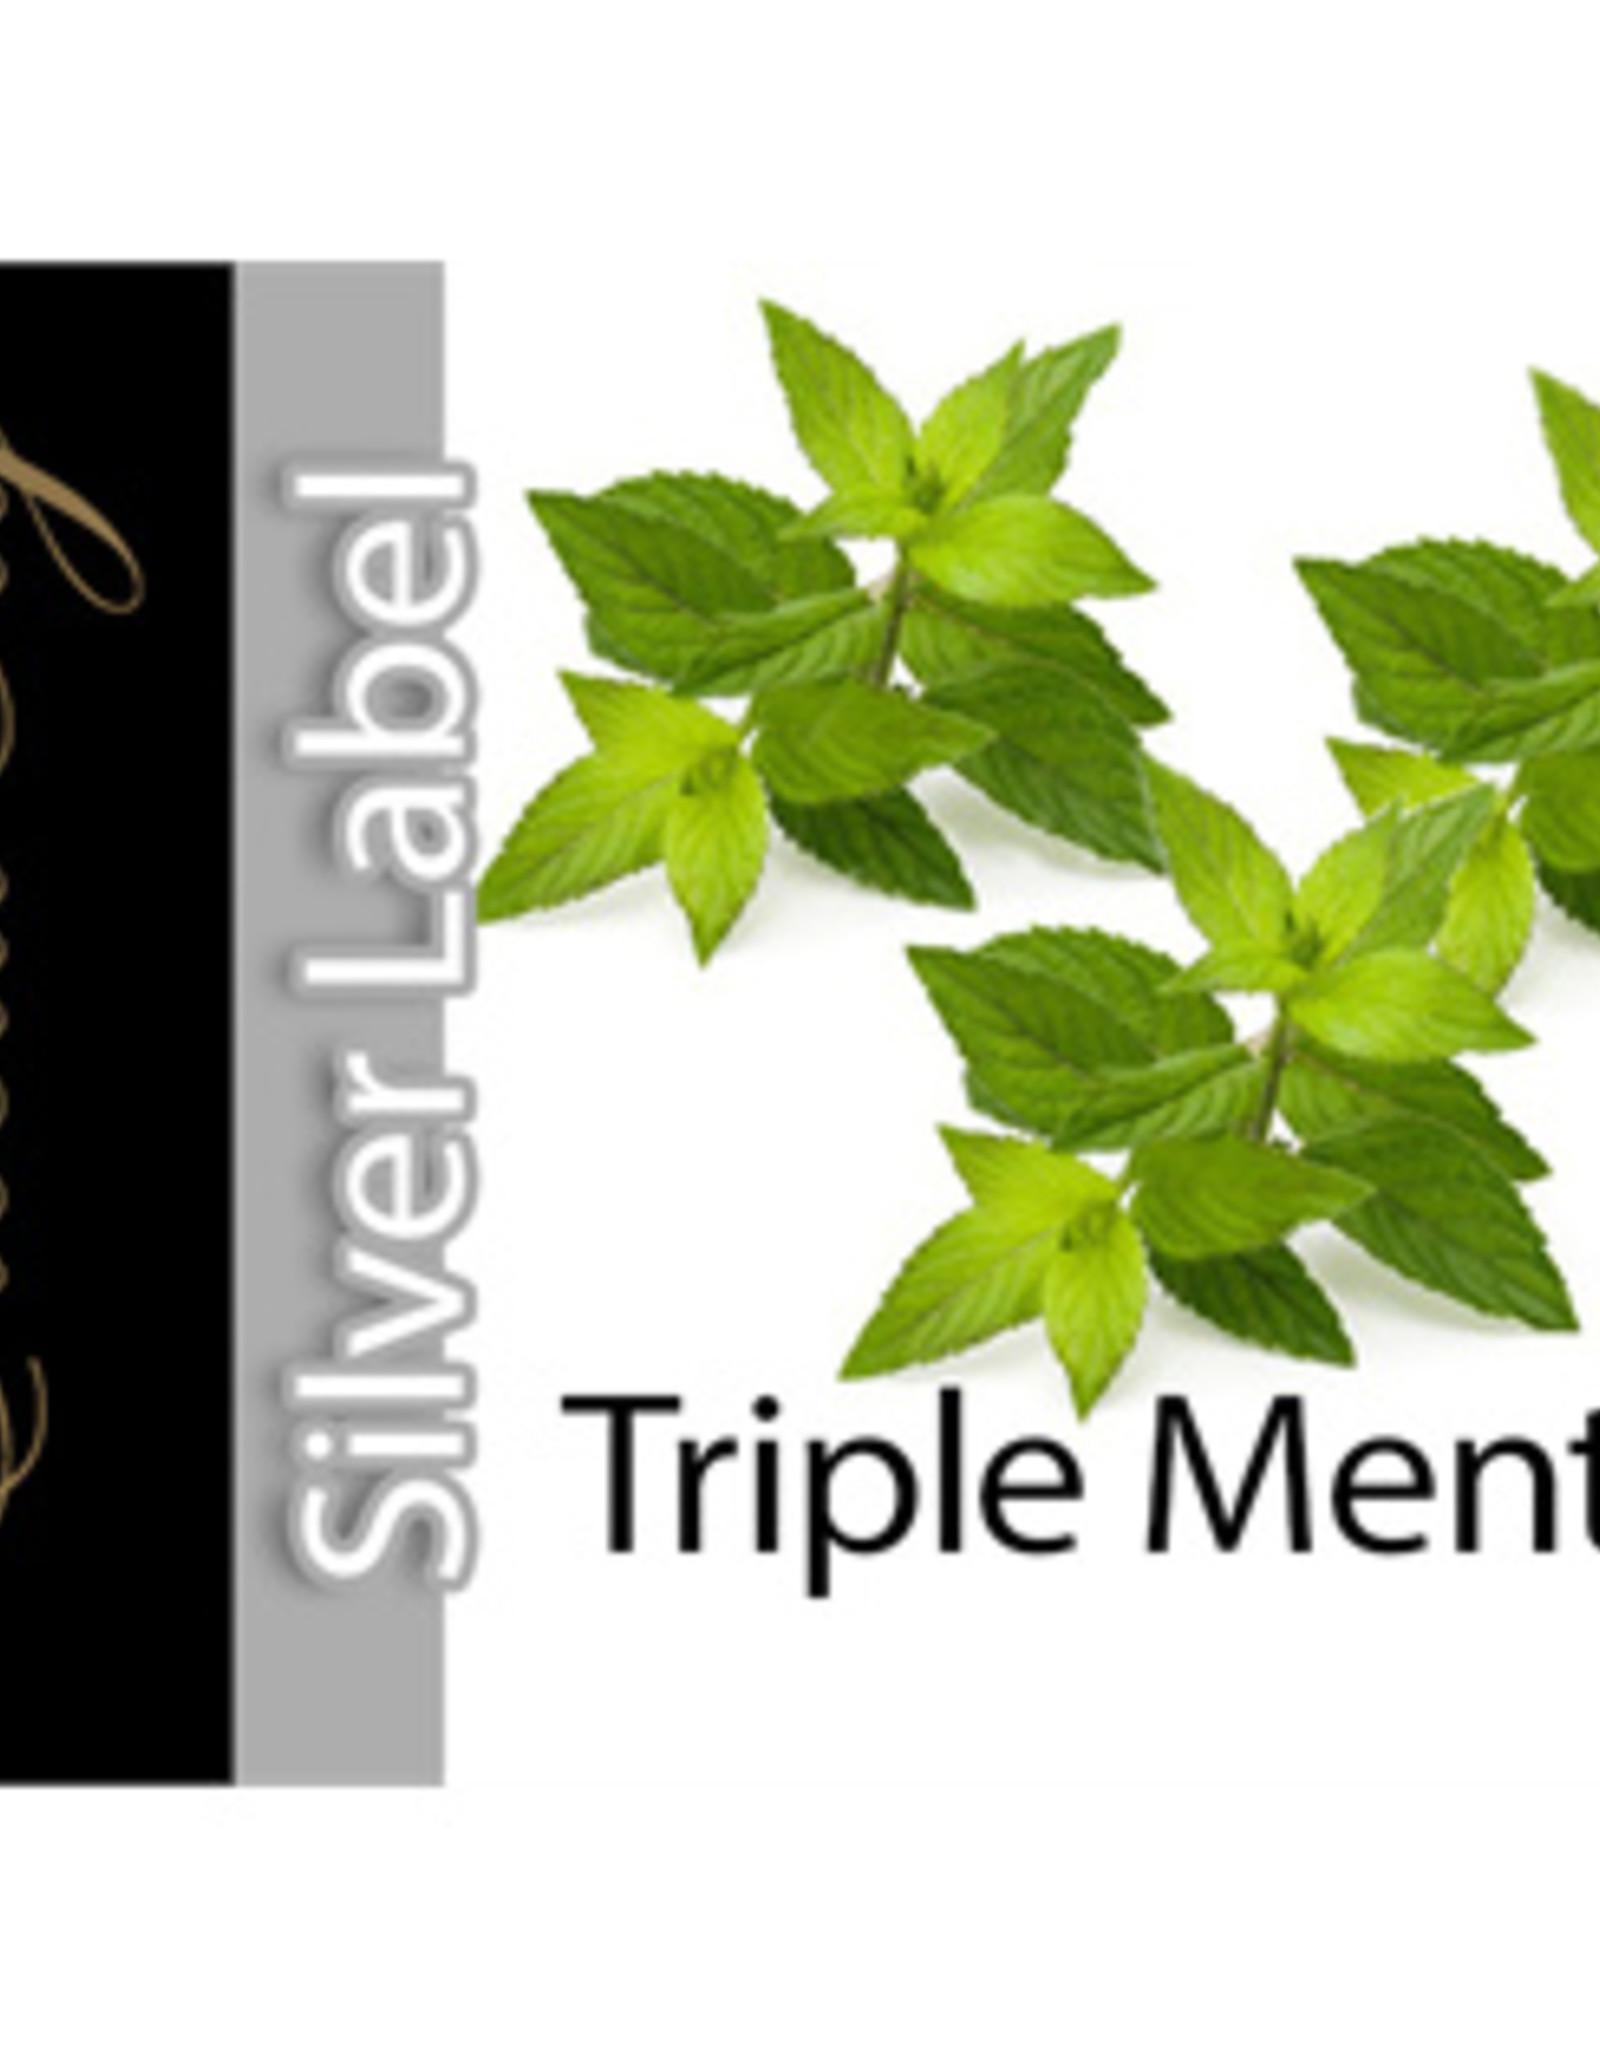 Exclucig Exclucig Silver Label E-liquid Triple Menthol 6 mg Nicotine